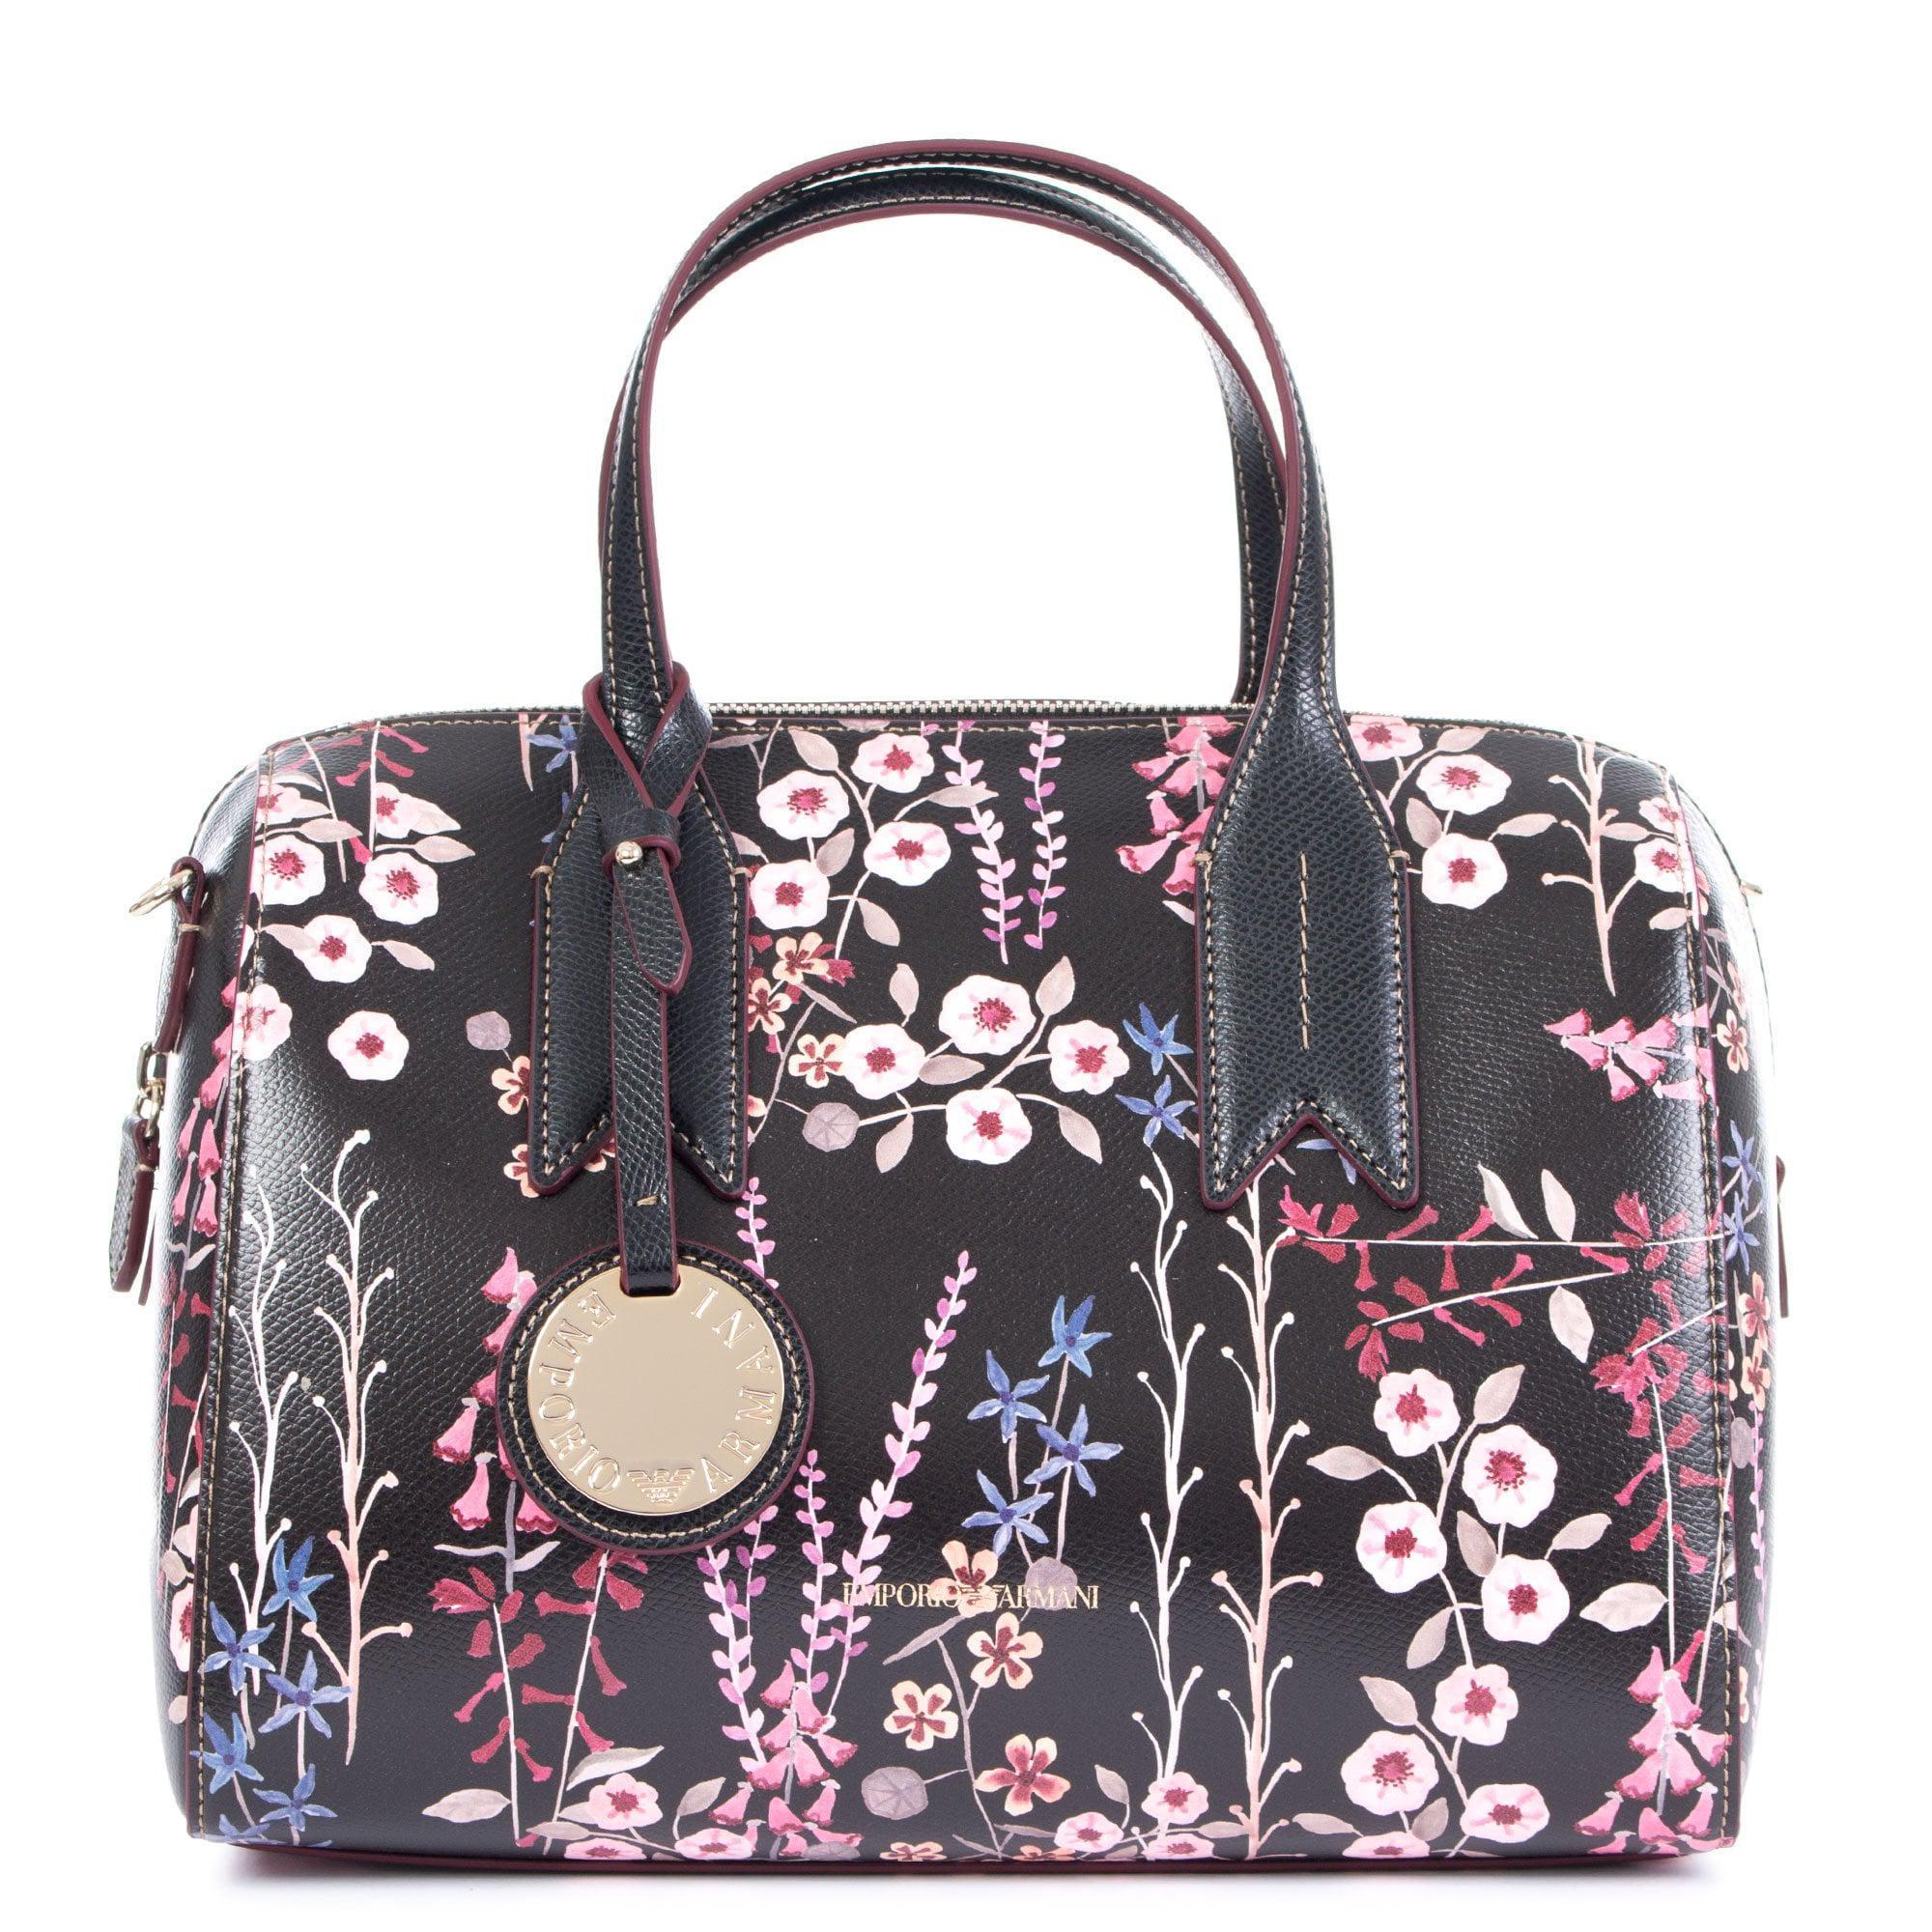 c630df670c Emporio Armani Floral Print Bowling Bag in Brown - Lyst